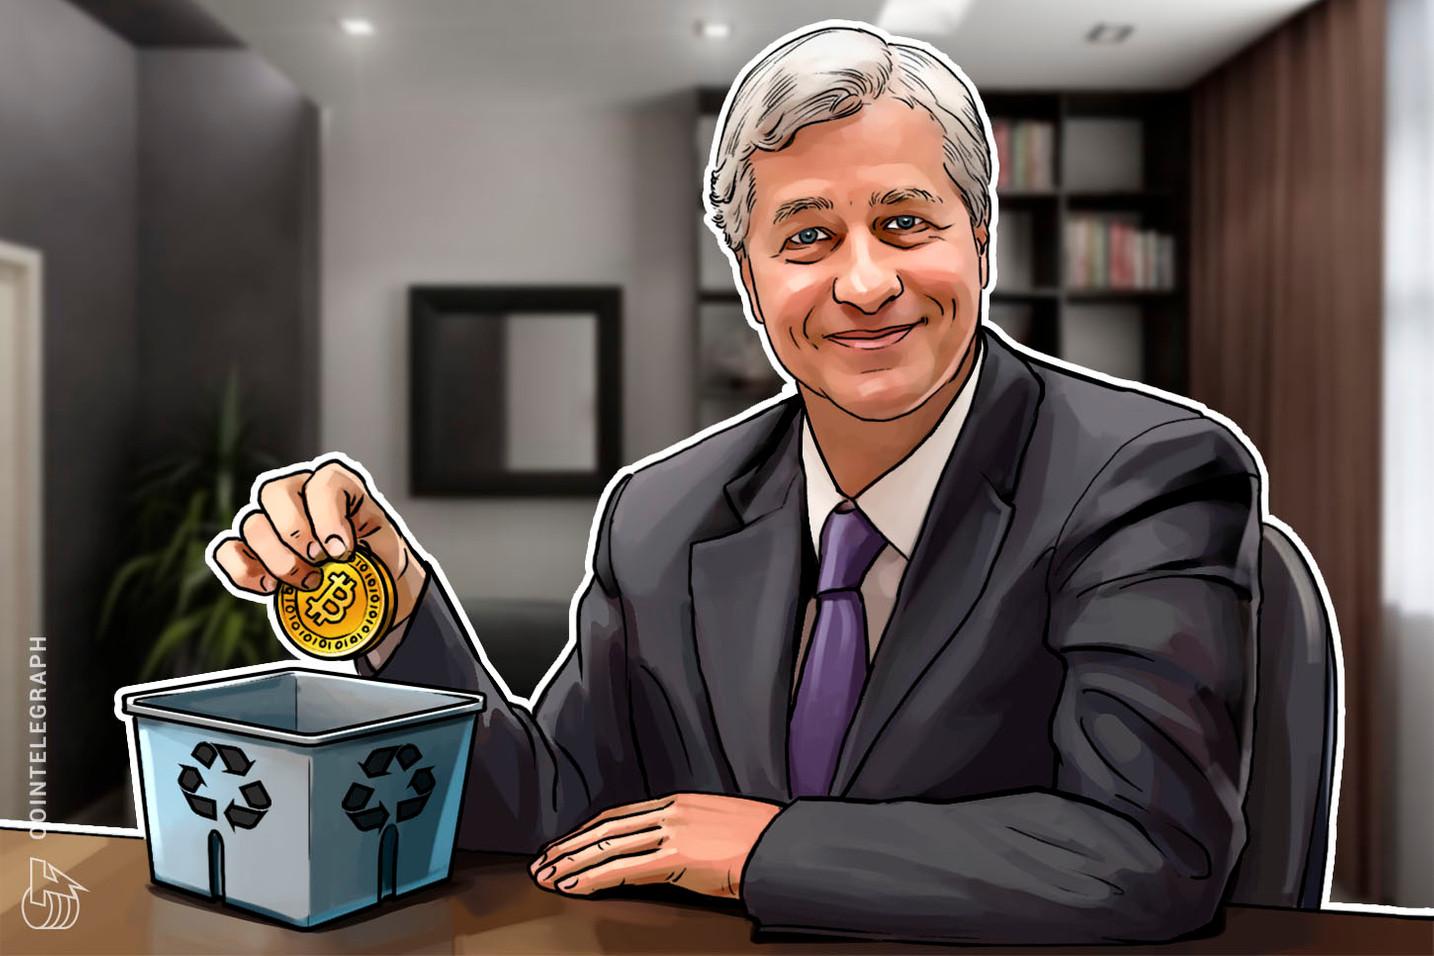 JPMorgans CEO Jamie Dimon führt Bitcoin-Beschimpfung fort